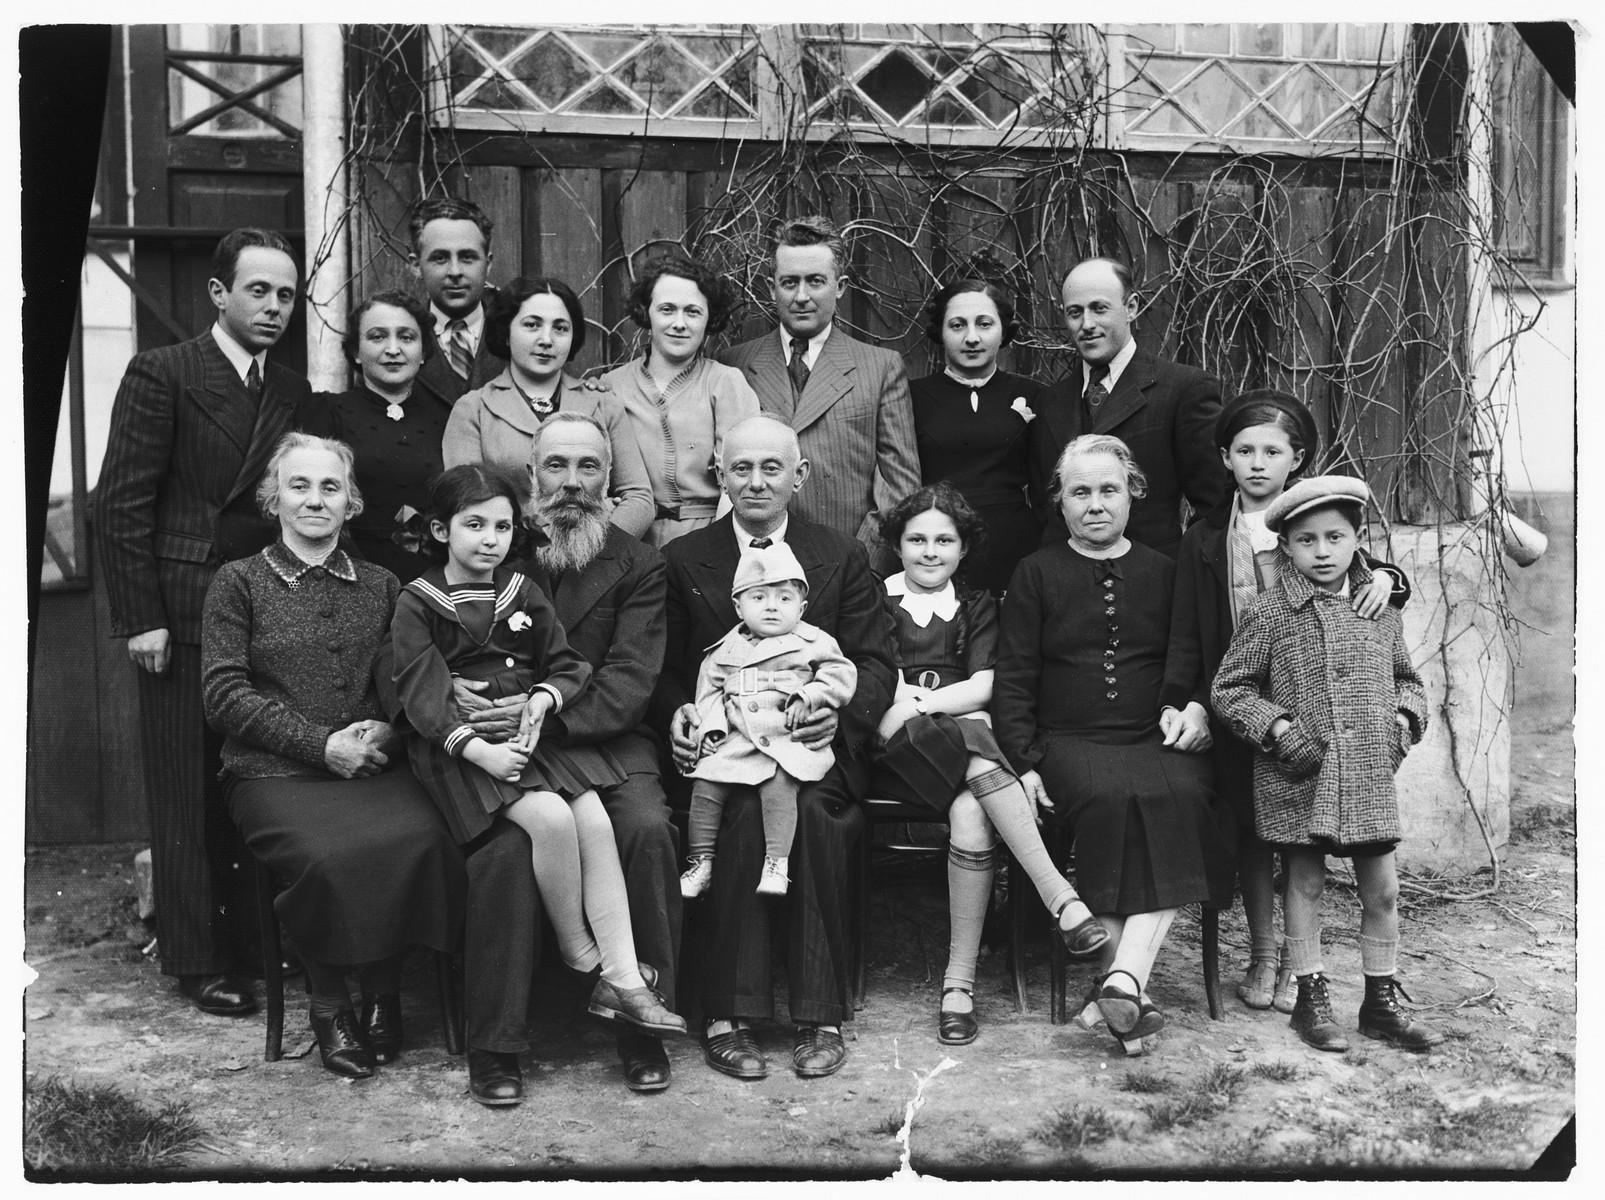 Portrait of the extended Sztejnsznajd and Gertner families taken on Passover shortly before the family of Josef Sztejnsznajd departed for America.  Pictured left to right.  Front row: Sara Teresz, Lila Garber, Uncle Avraham, Moshe Gertner, Chaim Sztejnsznajd, Sara Sztejnsznajd, Cipora Gertner, two Weinstein children.  Back row: Avraham Gertner, Baila Sztejnsznajd, Josef Sztejnsznajd, Peppa Garber, Goldie Sztejnsznajd, Czala Garber, Peppa Gertner, and Josef Gertner.